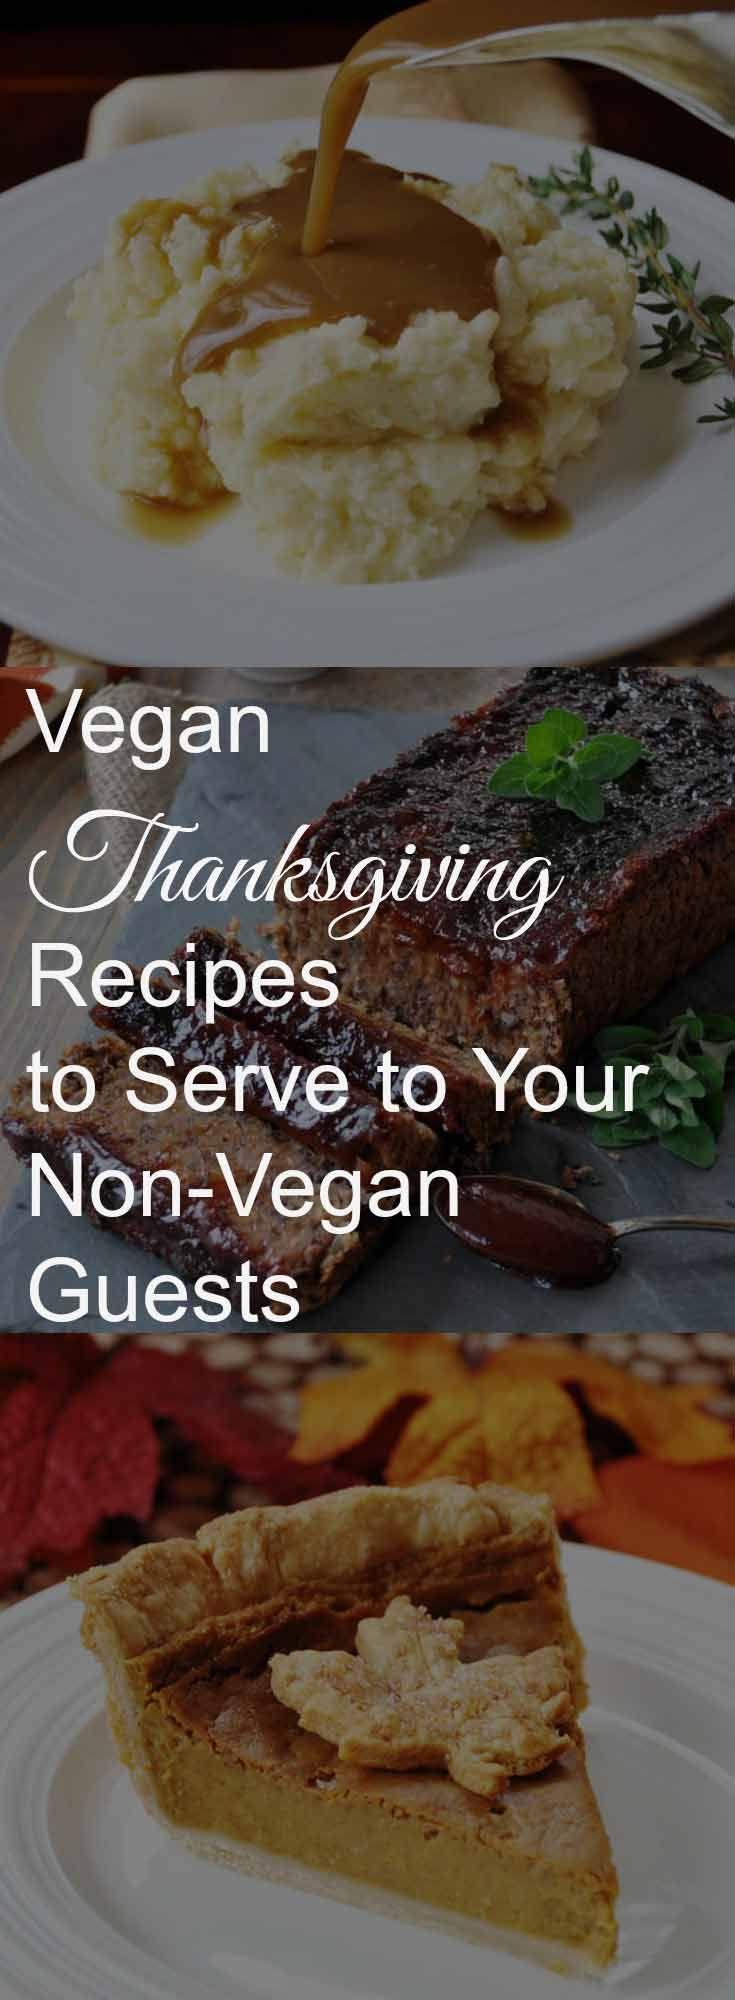 Vegan Thanksgiving recipes that your non-vegan guests will love! www.veganosity.com